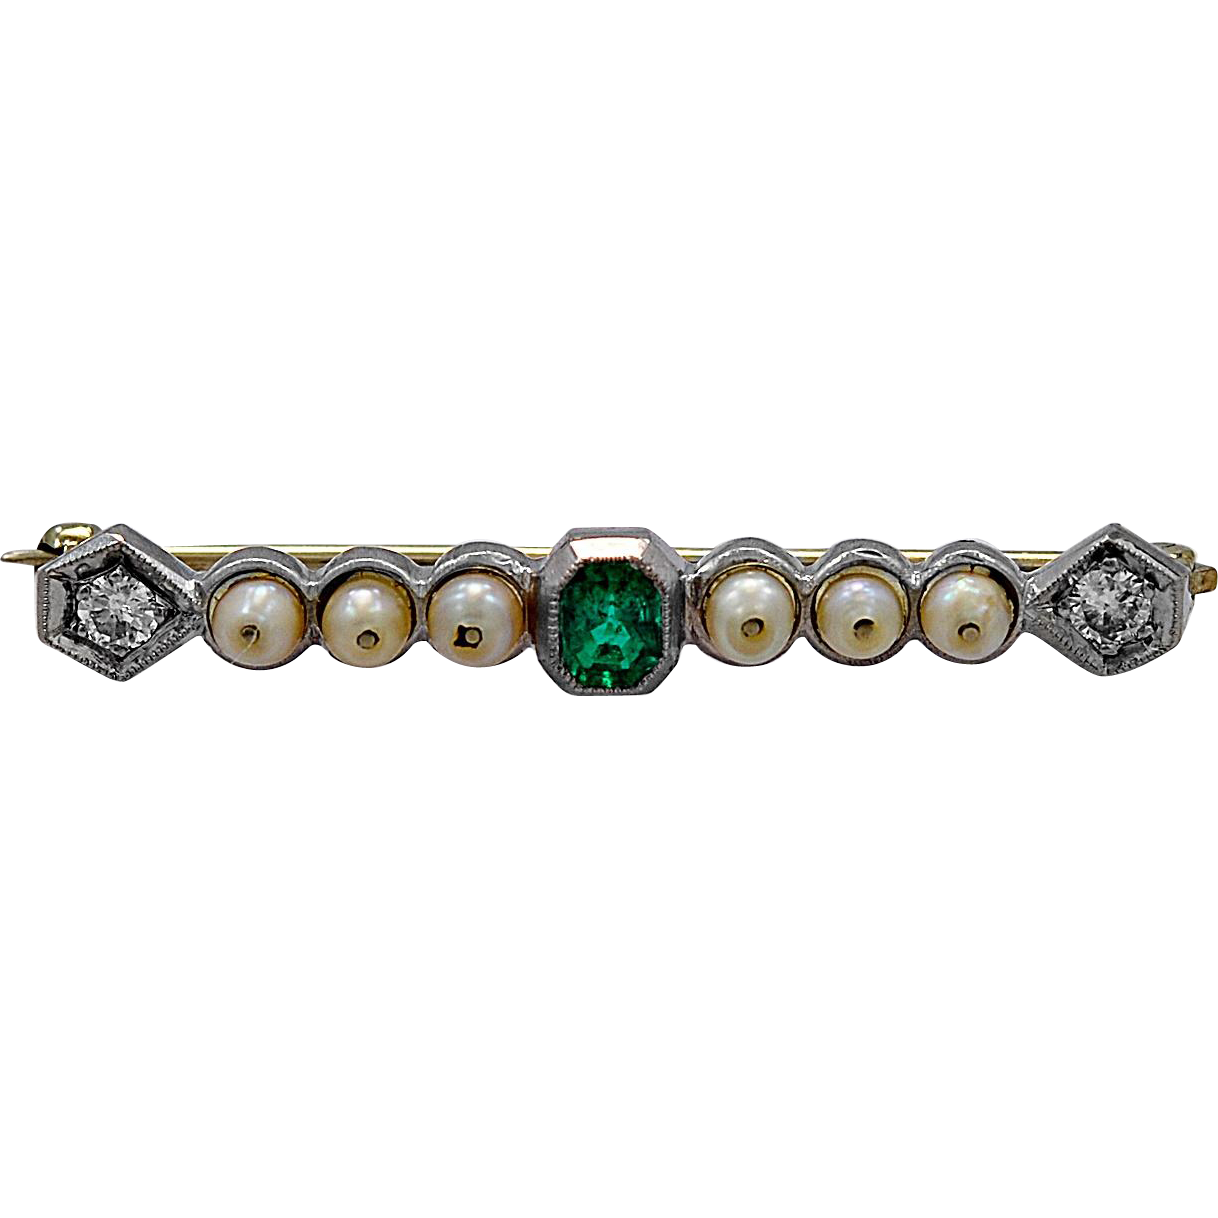 Antique Brooch .40ct. Emerald, Diamond, Pearl & Platinum Art Deco - J35810